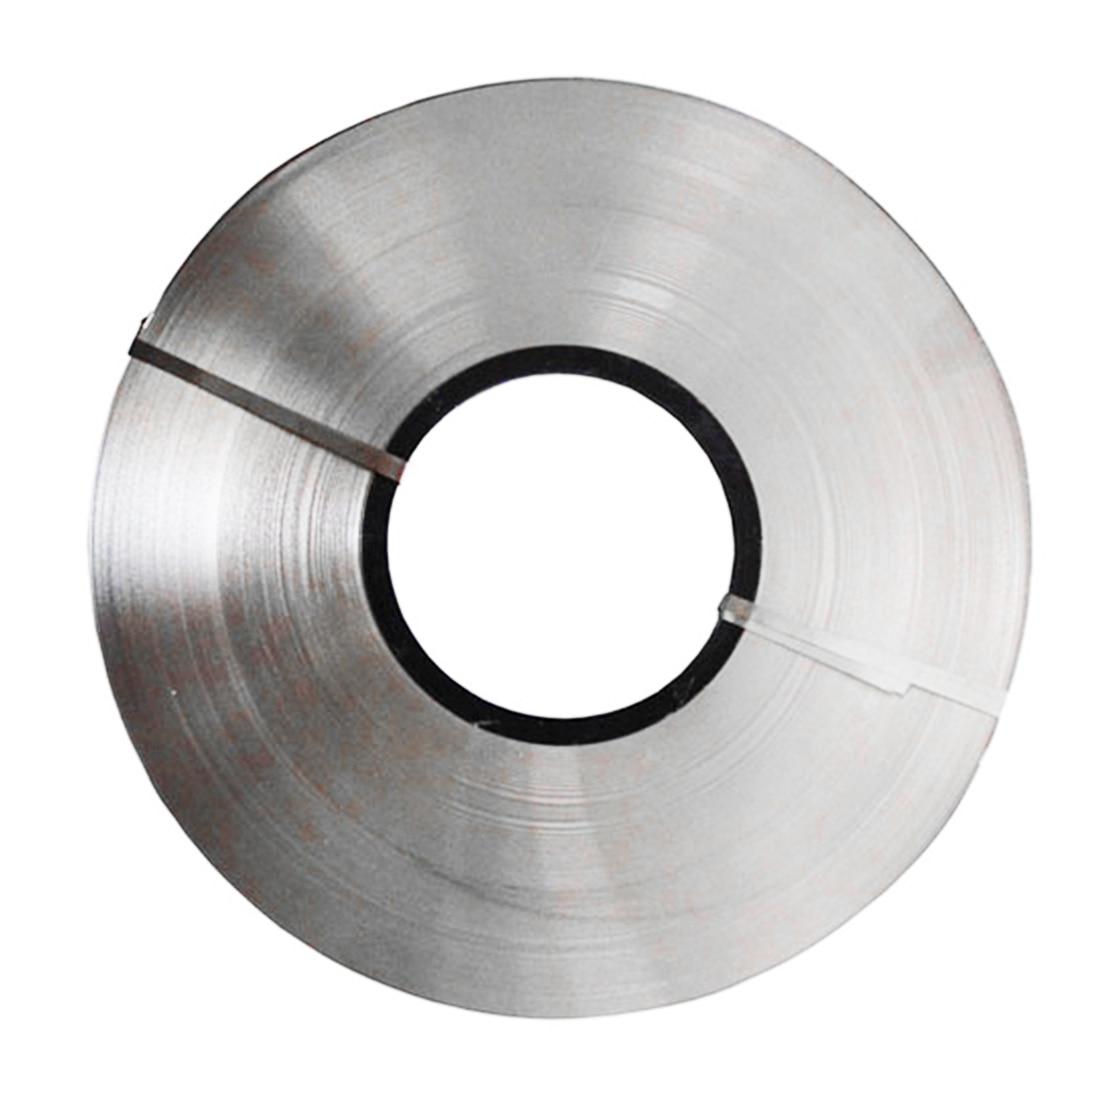 1pcs 0.1 X 5mm 200cm Pure Nickel Strip Tape For Spot Welder Machine For Li 18650 Battery Spot Welding Compatible